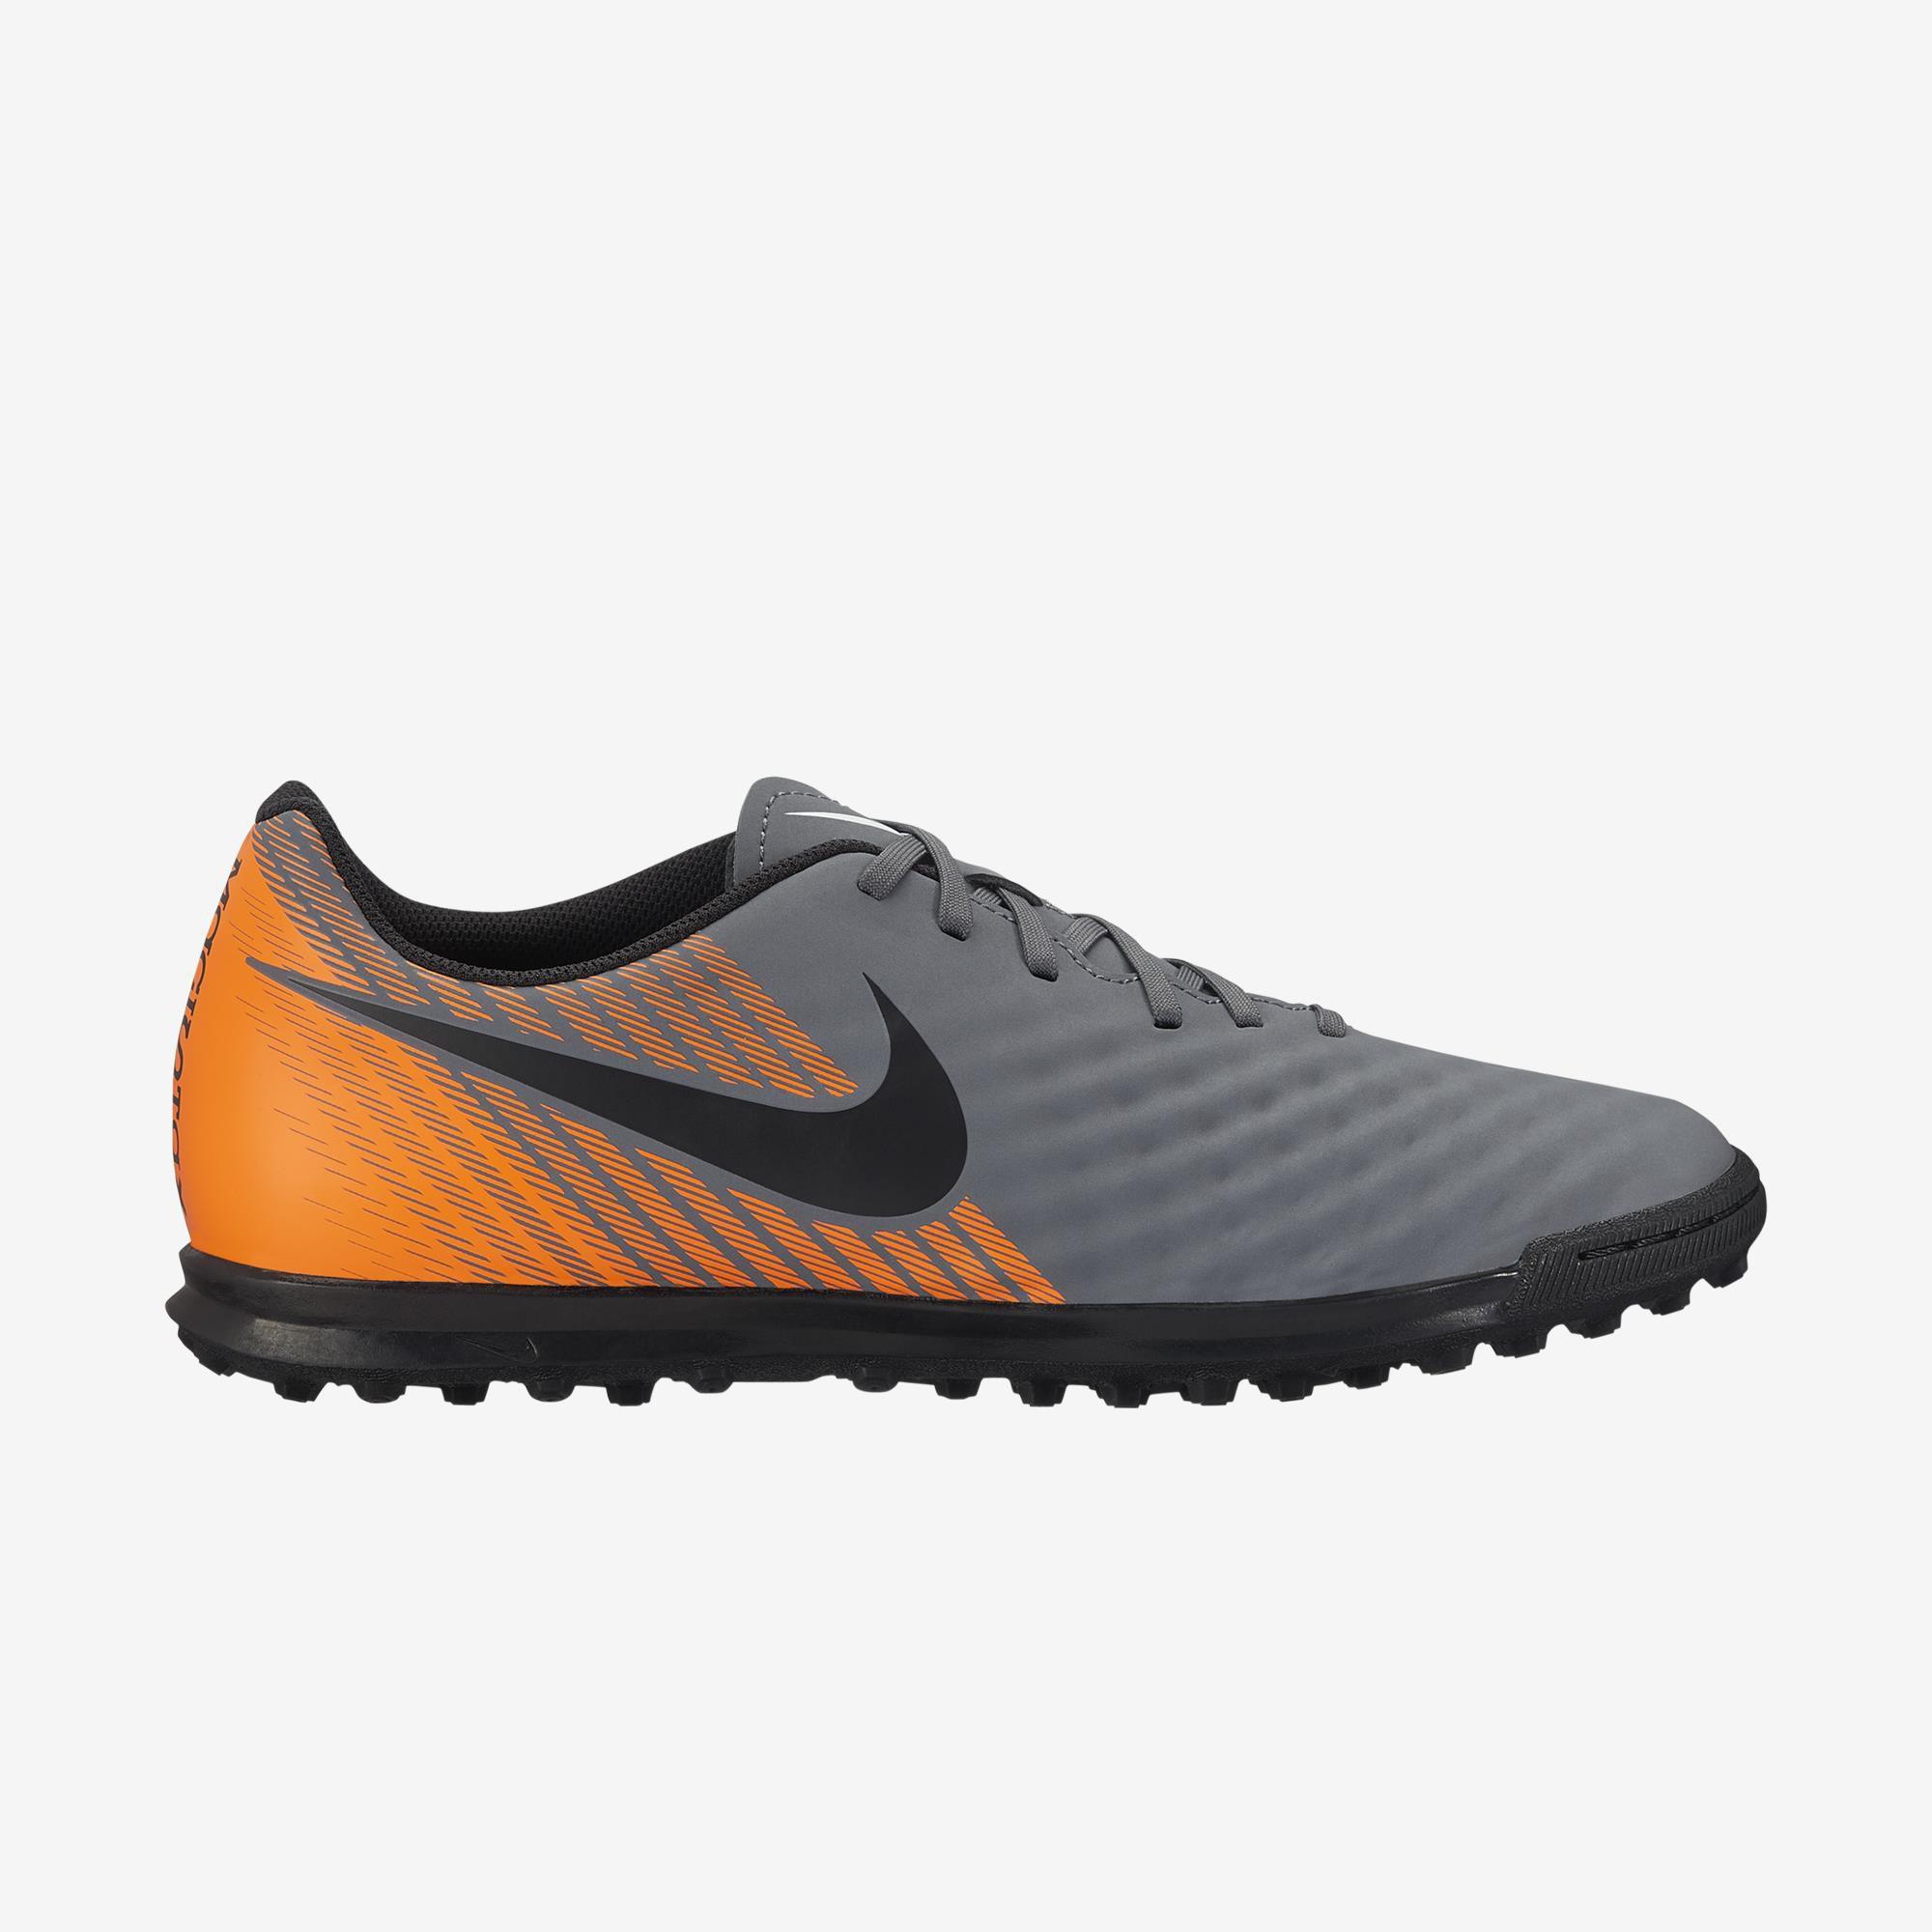 Chuteira Masculina Nike Magista  Chuteira Masculina Nike Magista ... ba964f828e0d9